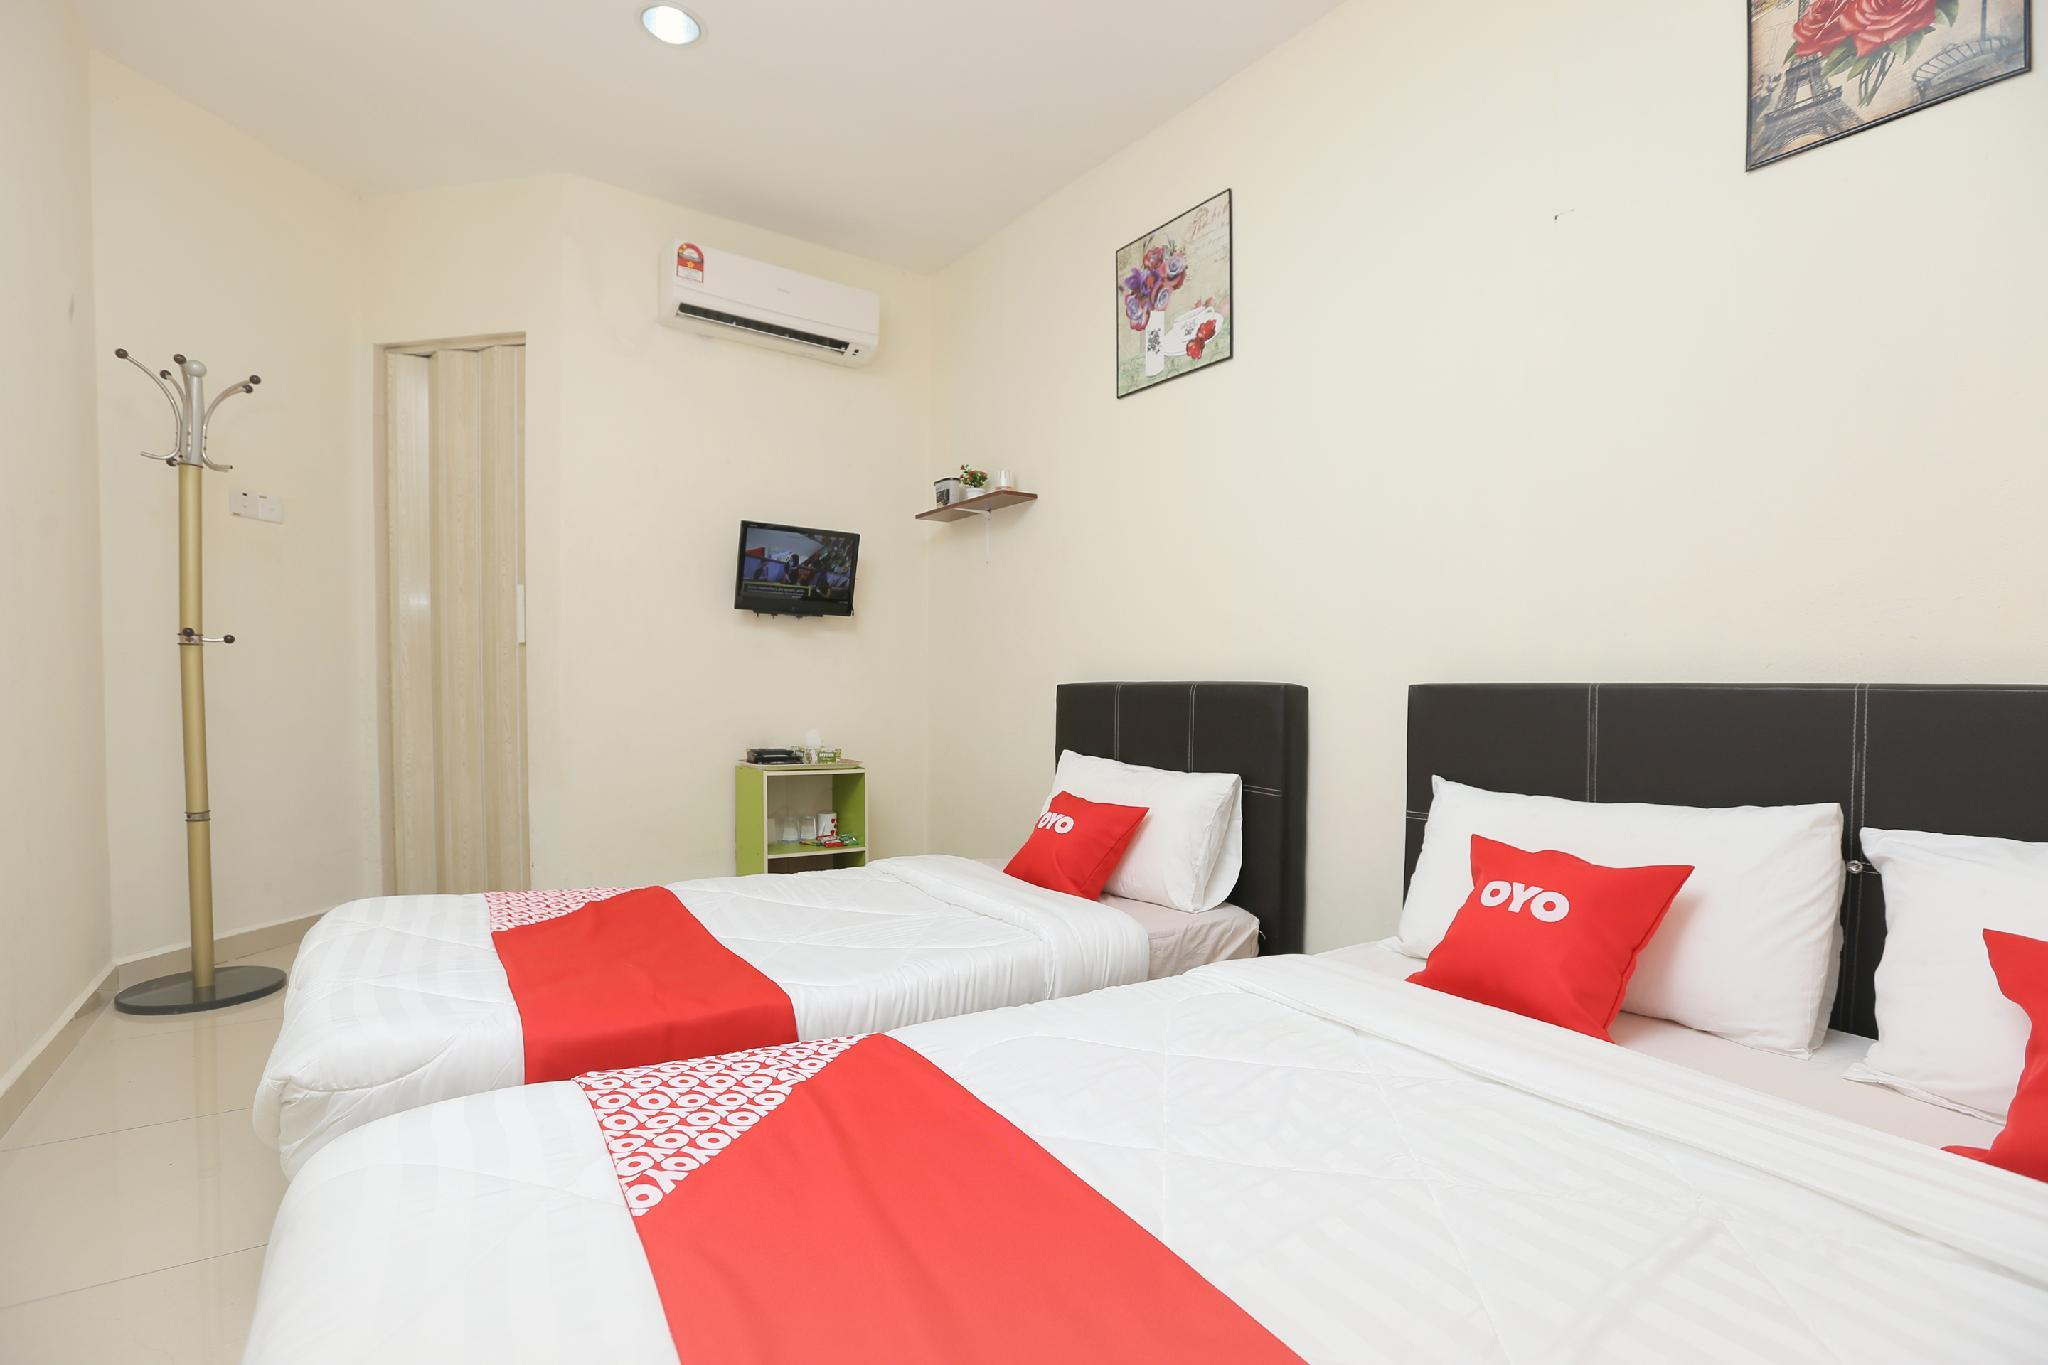 OYO 89902 Semerah Suites Homestay Pontian